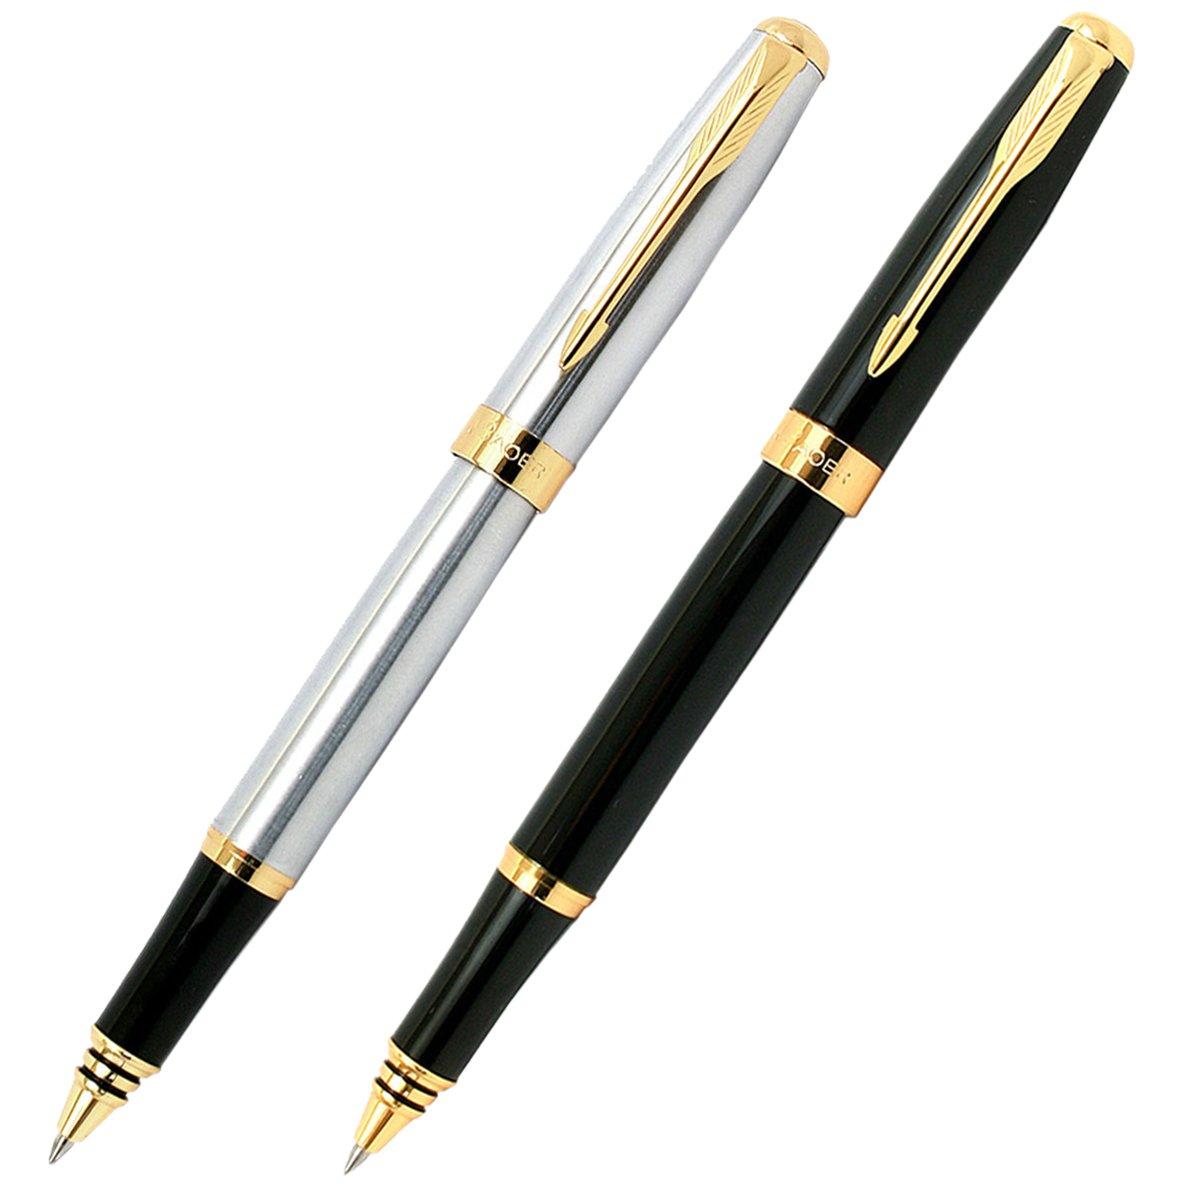 GOLD LEAF Baoer Royal 388 Sliver & Black Roller Pens Combo Gift Set Pack of  2: Amazon.in: Office Products